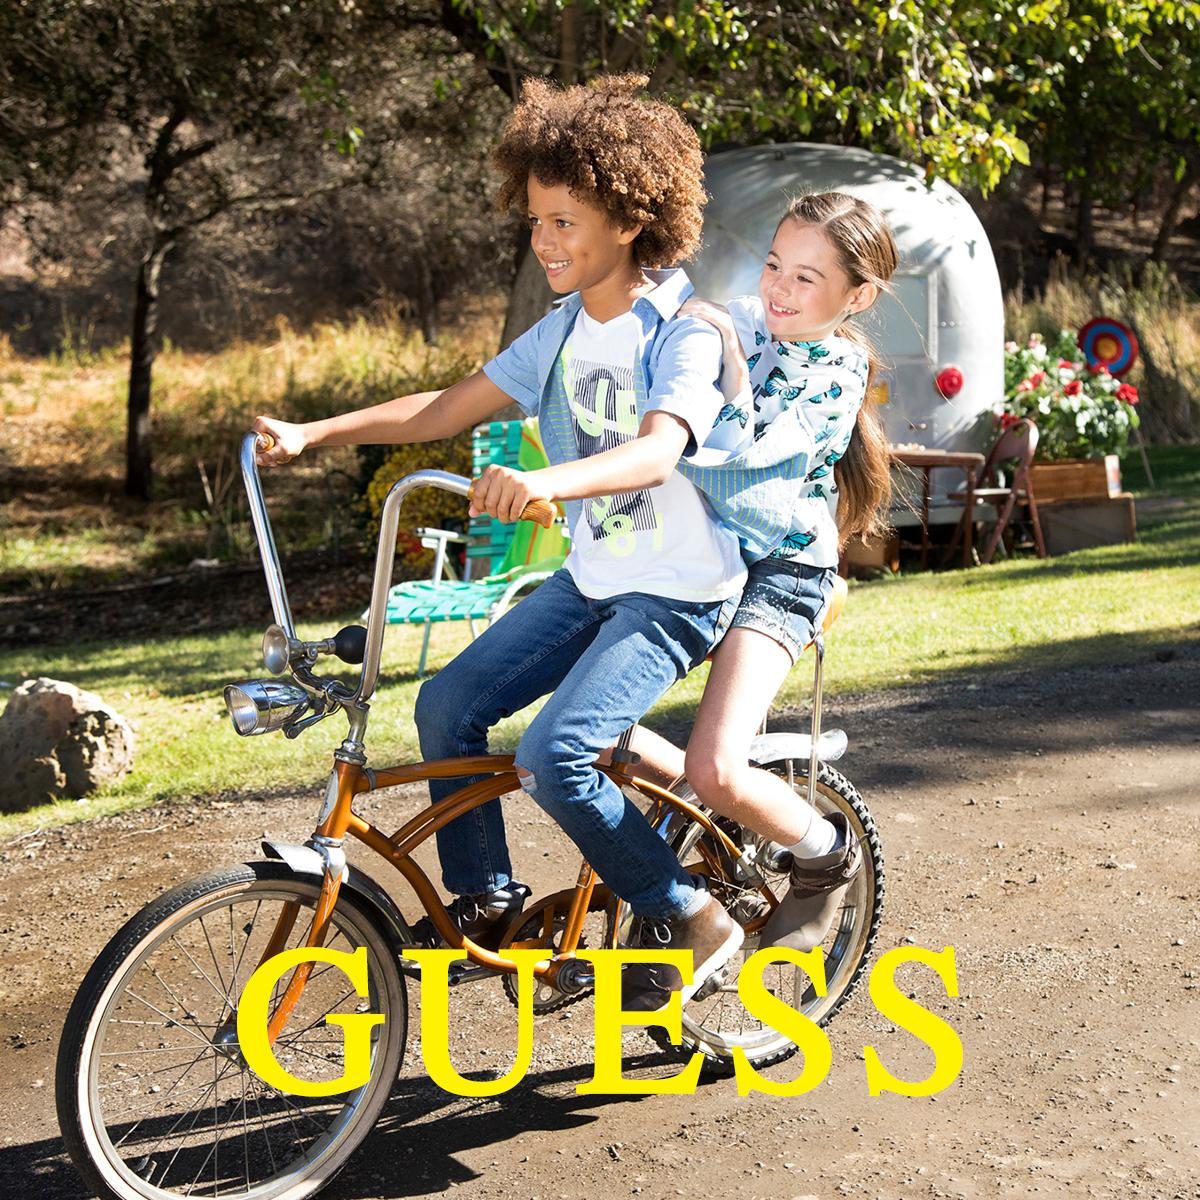 Kolekcja Guess Kids 2020!